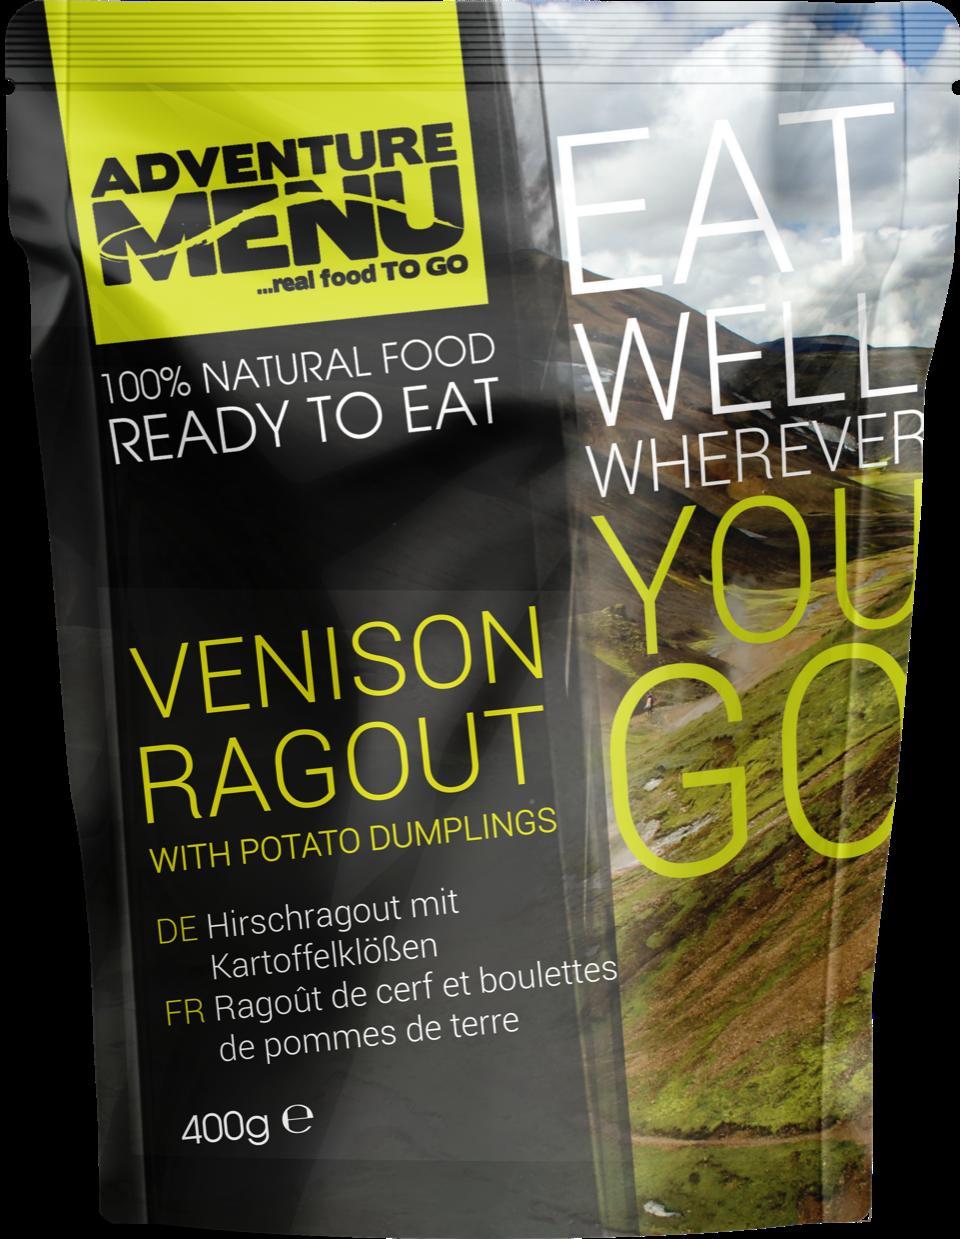 Venison-ragout-with-potato-dumplings - camping food camping meals